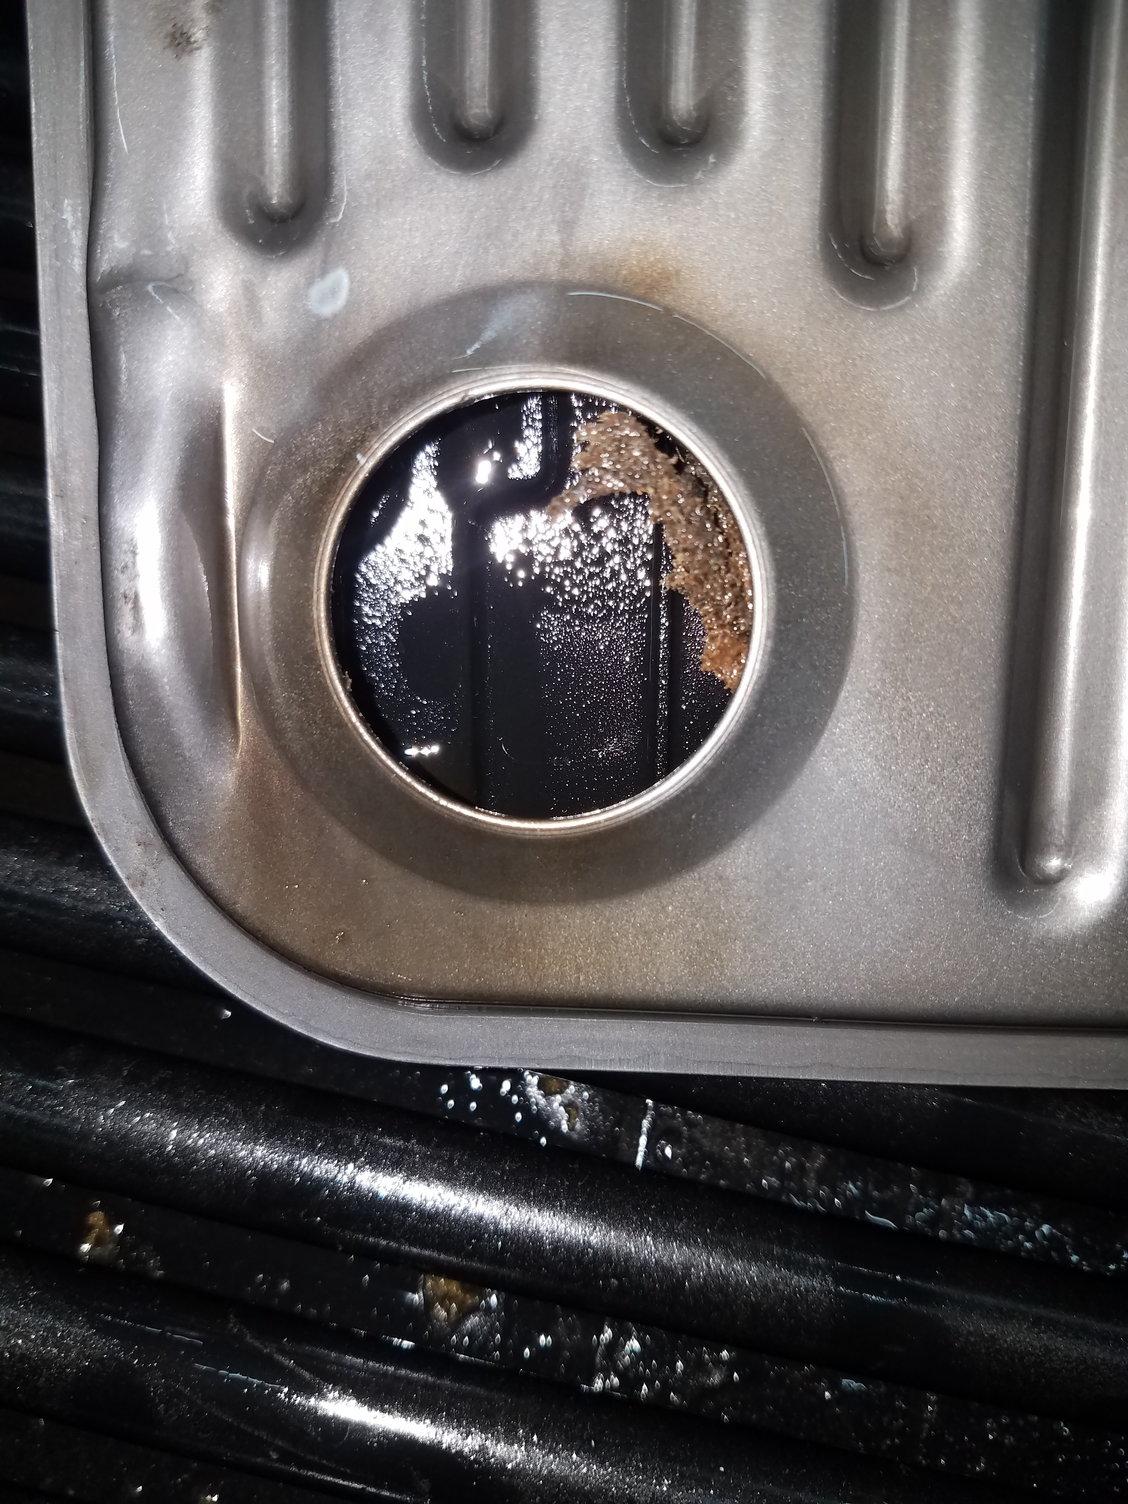 4L80E pump failure - LS1TECH - Camaro and Firebird Forum Discussion